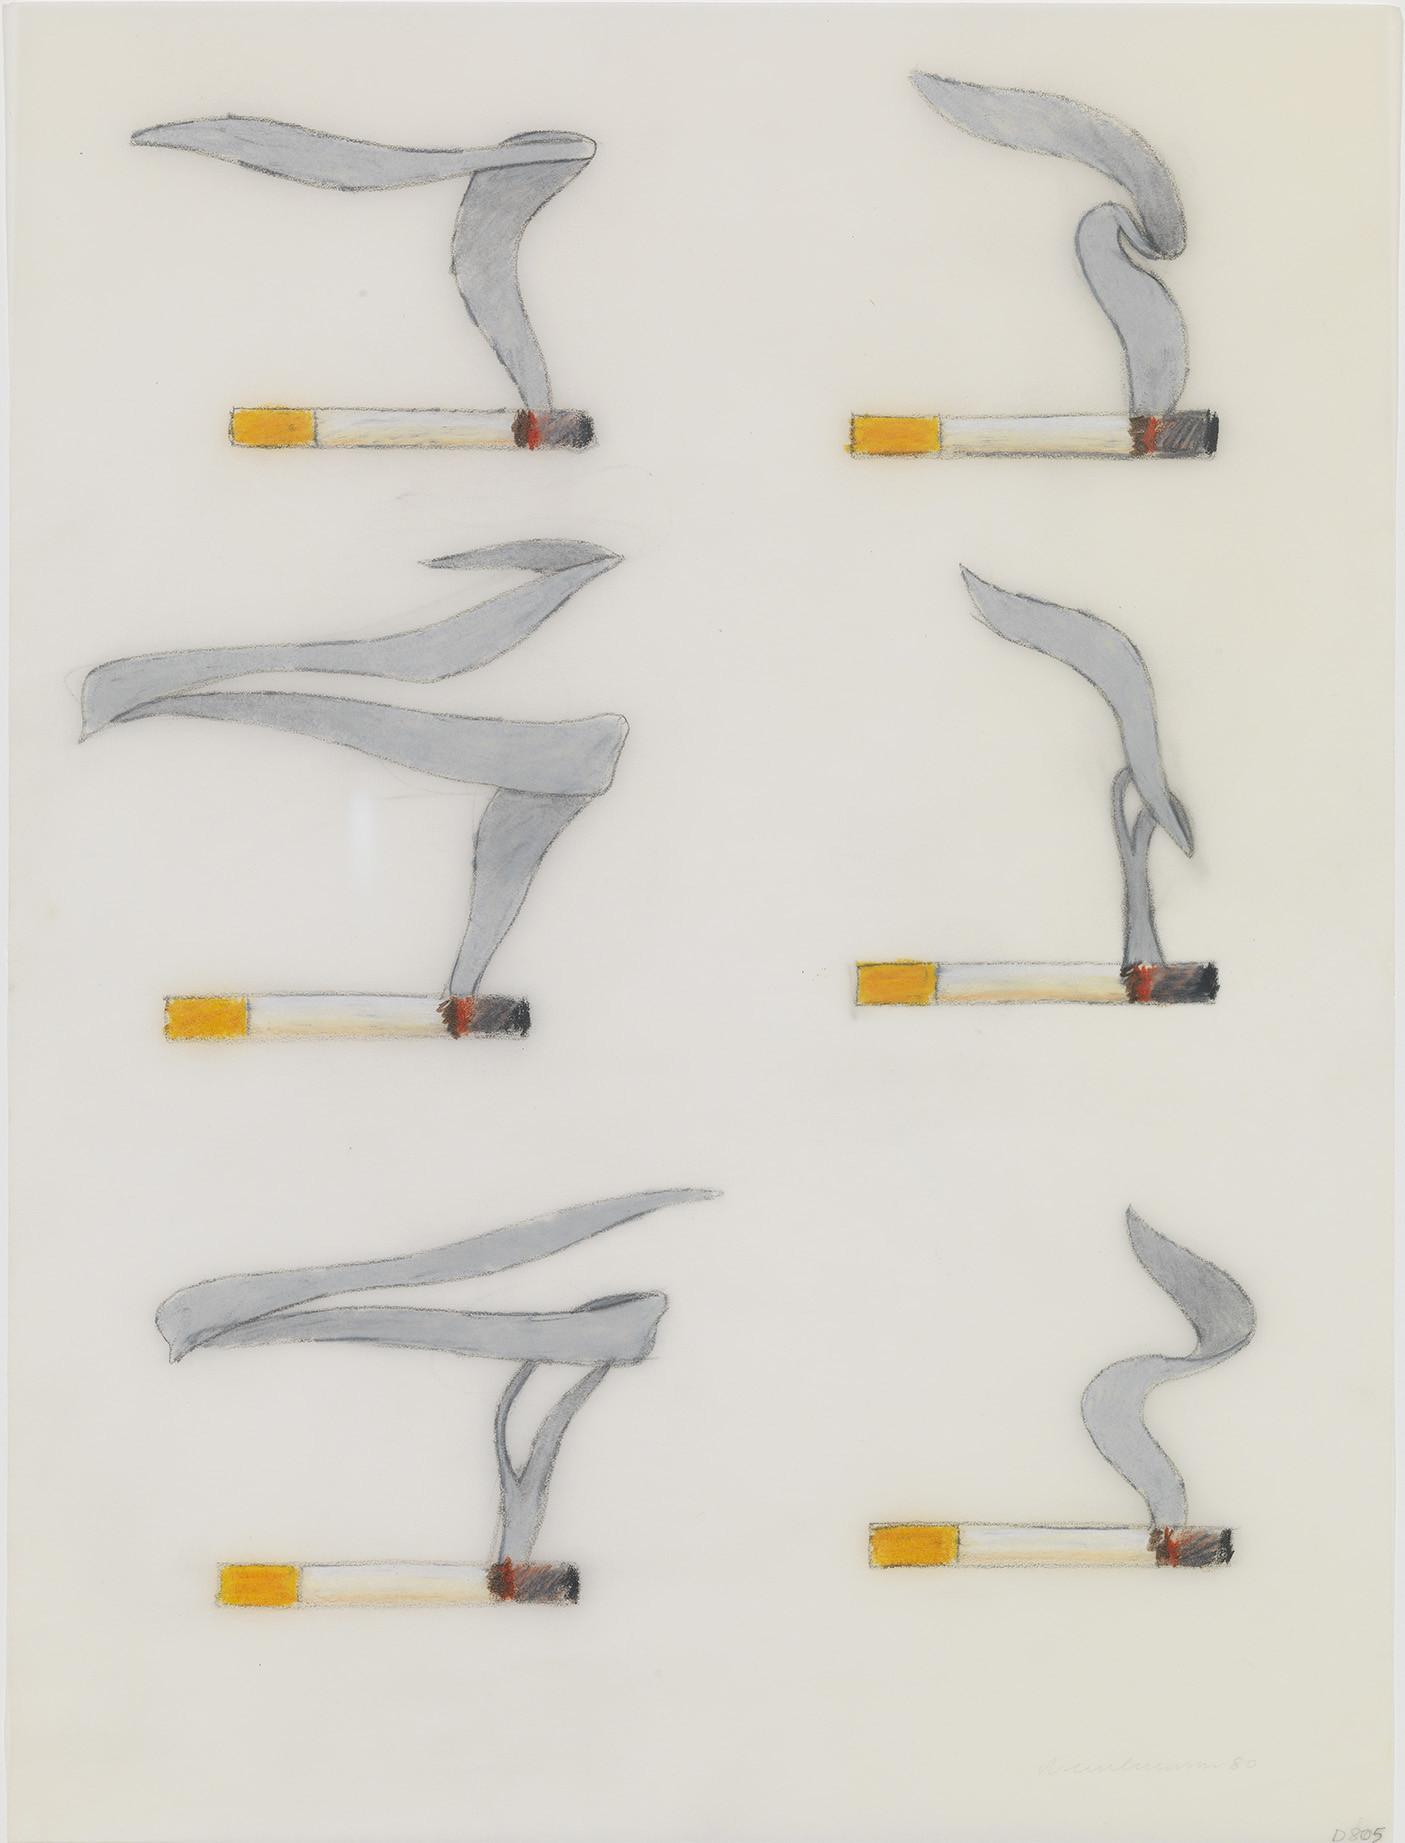 Tom Wesselmann at Gagosian Gallery